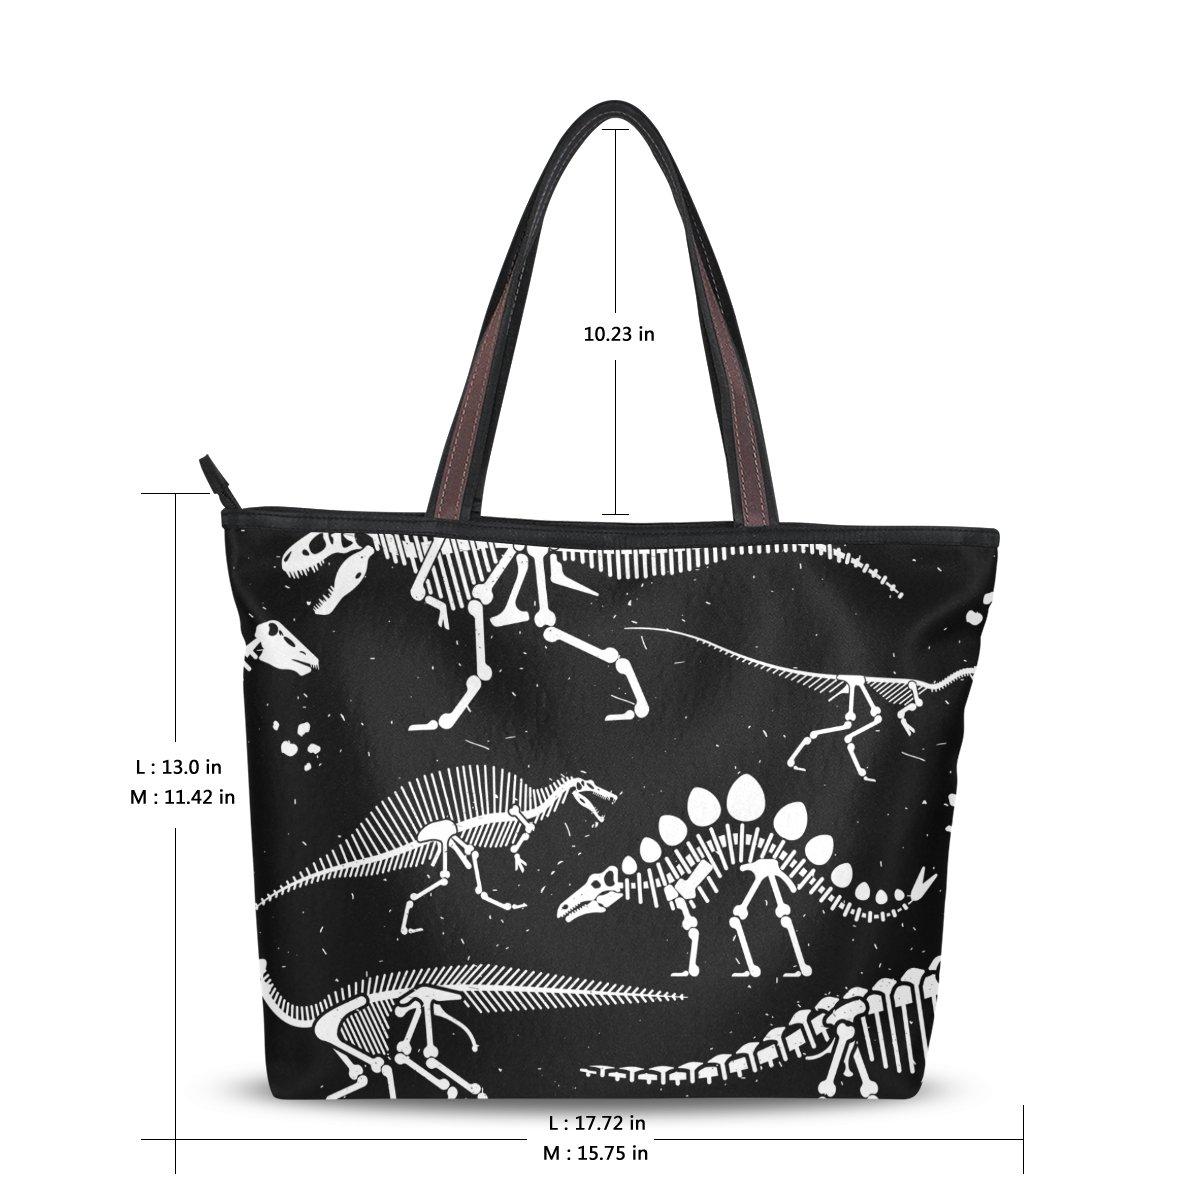 3283fb0e10e6 Amazon.com: WIHVE Dinosaur Skeleton Women's Tote Bag Top Handle Satchel  Handbags Shoulder Bags: Shoes